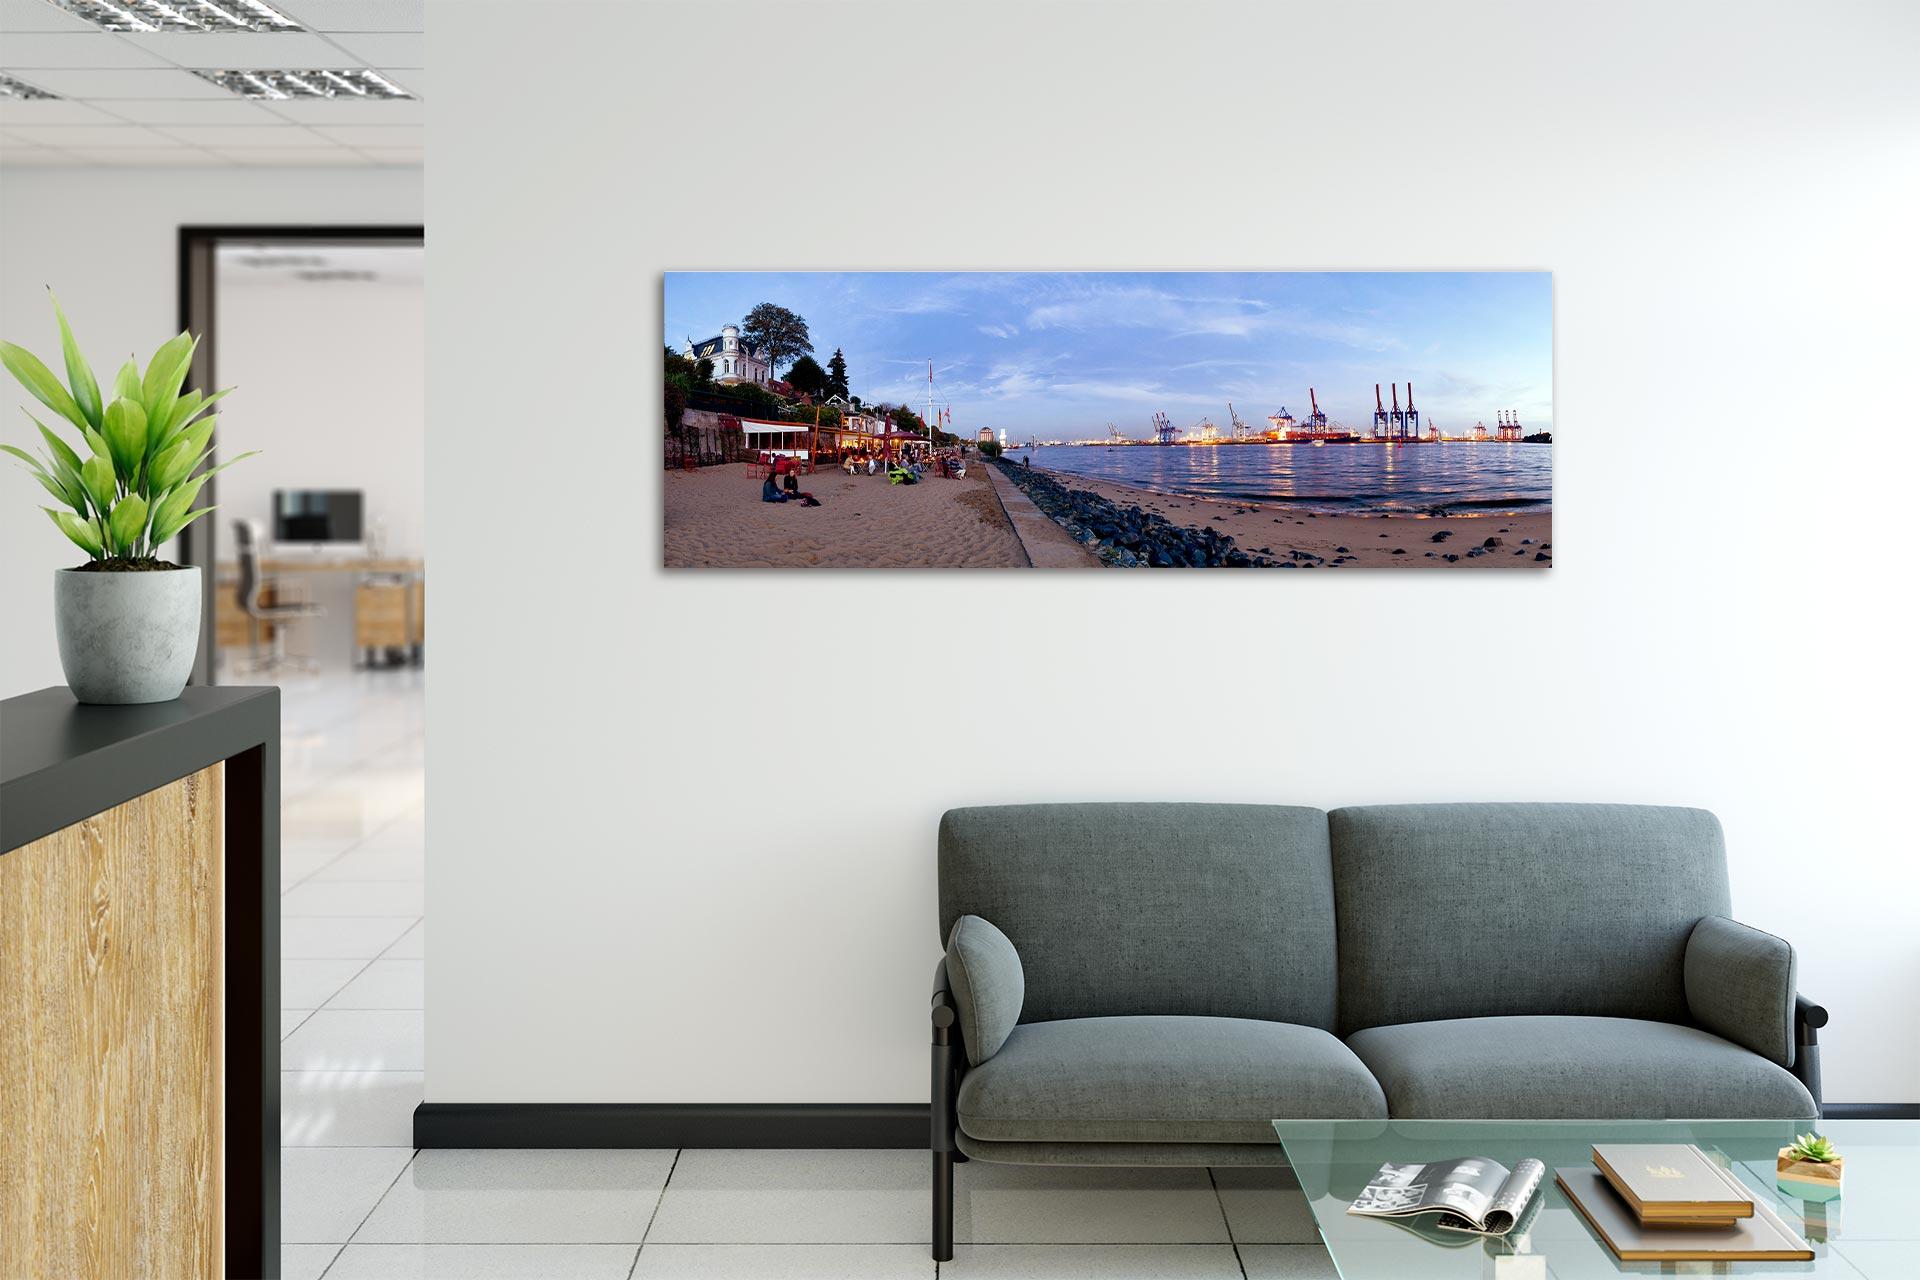 PSW020-elbstrand-panorama-hamburg-wandbild-leinwand-acrylglas-aludibond-empfang